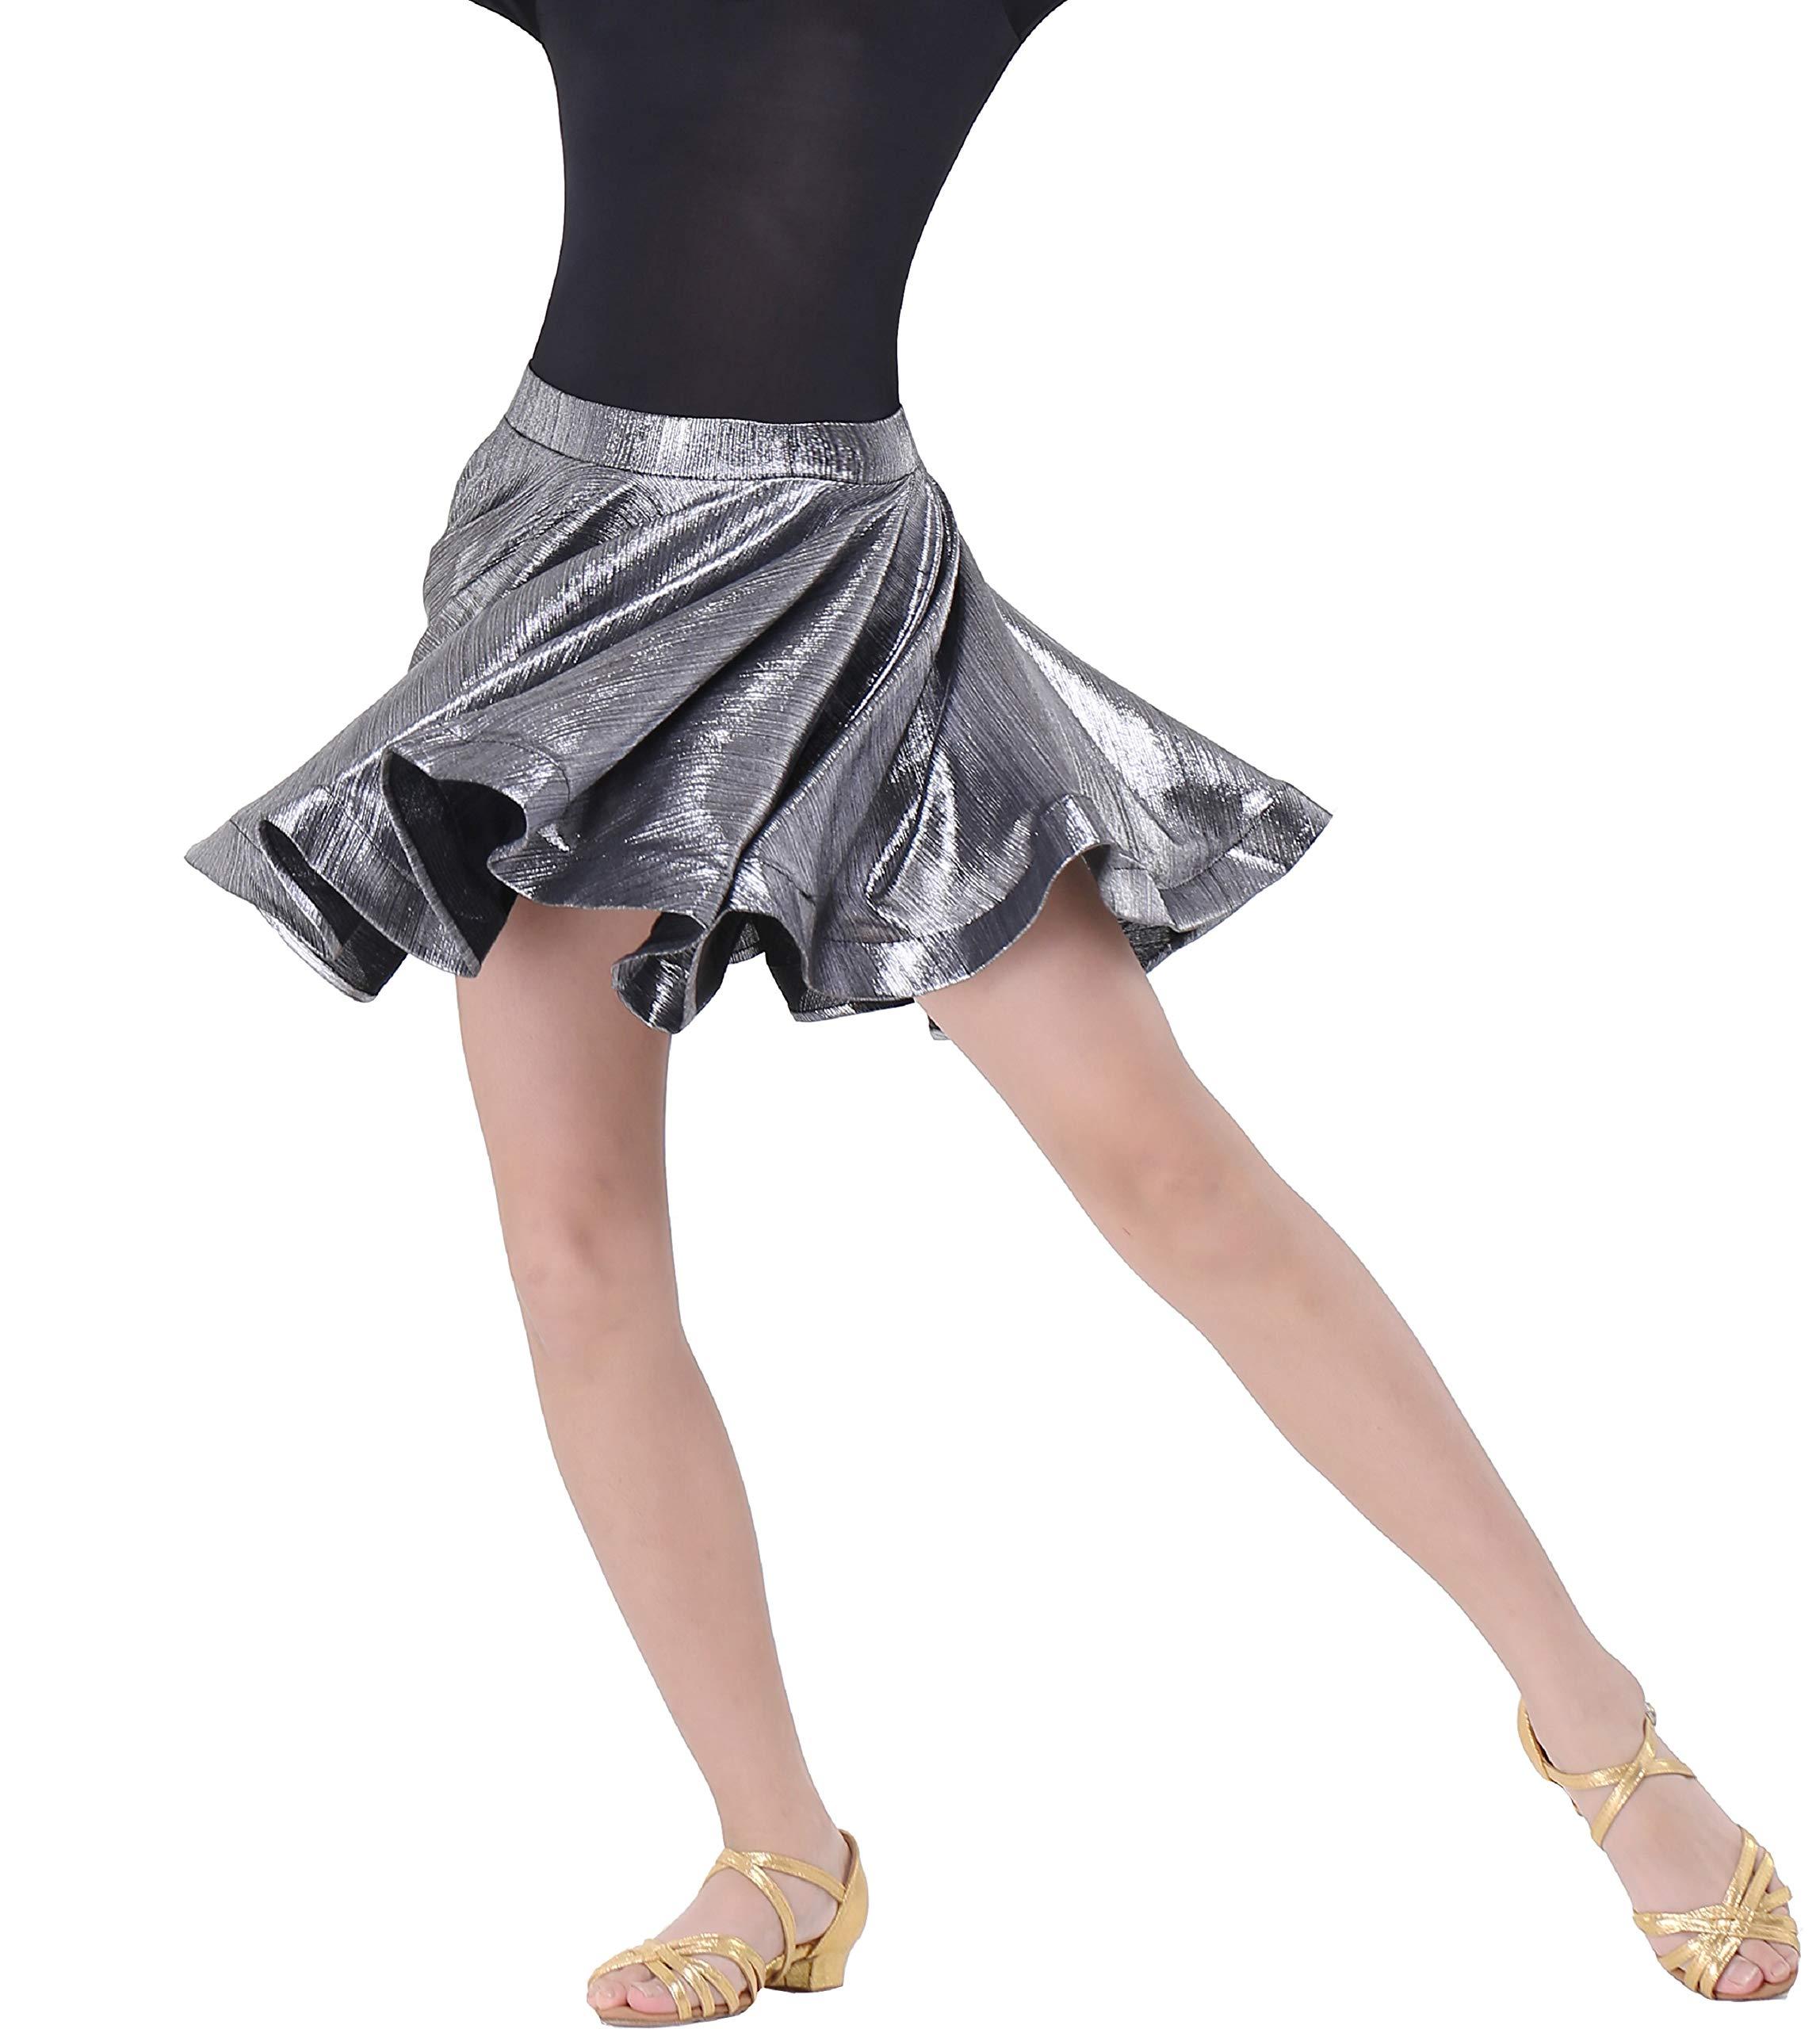 JEZISYMA Girls' Latin Salsa Ballroom Practice Dance Skirt (XL, Silver) by JEZISYMA